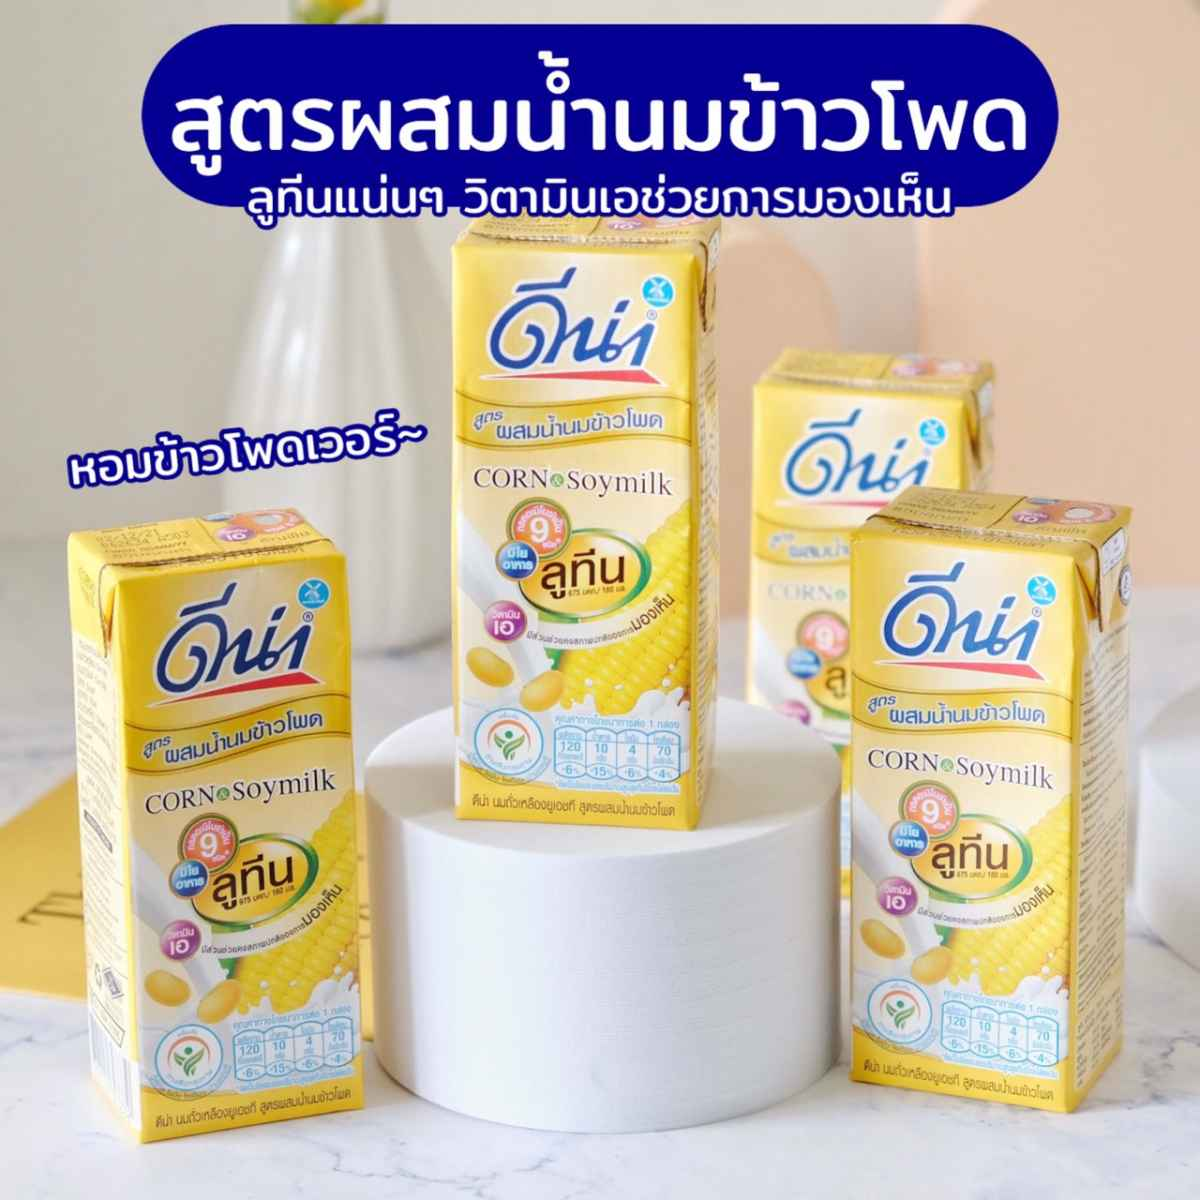 dna-soy-milk